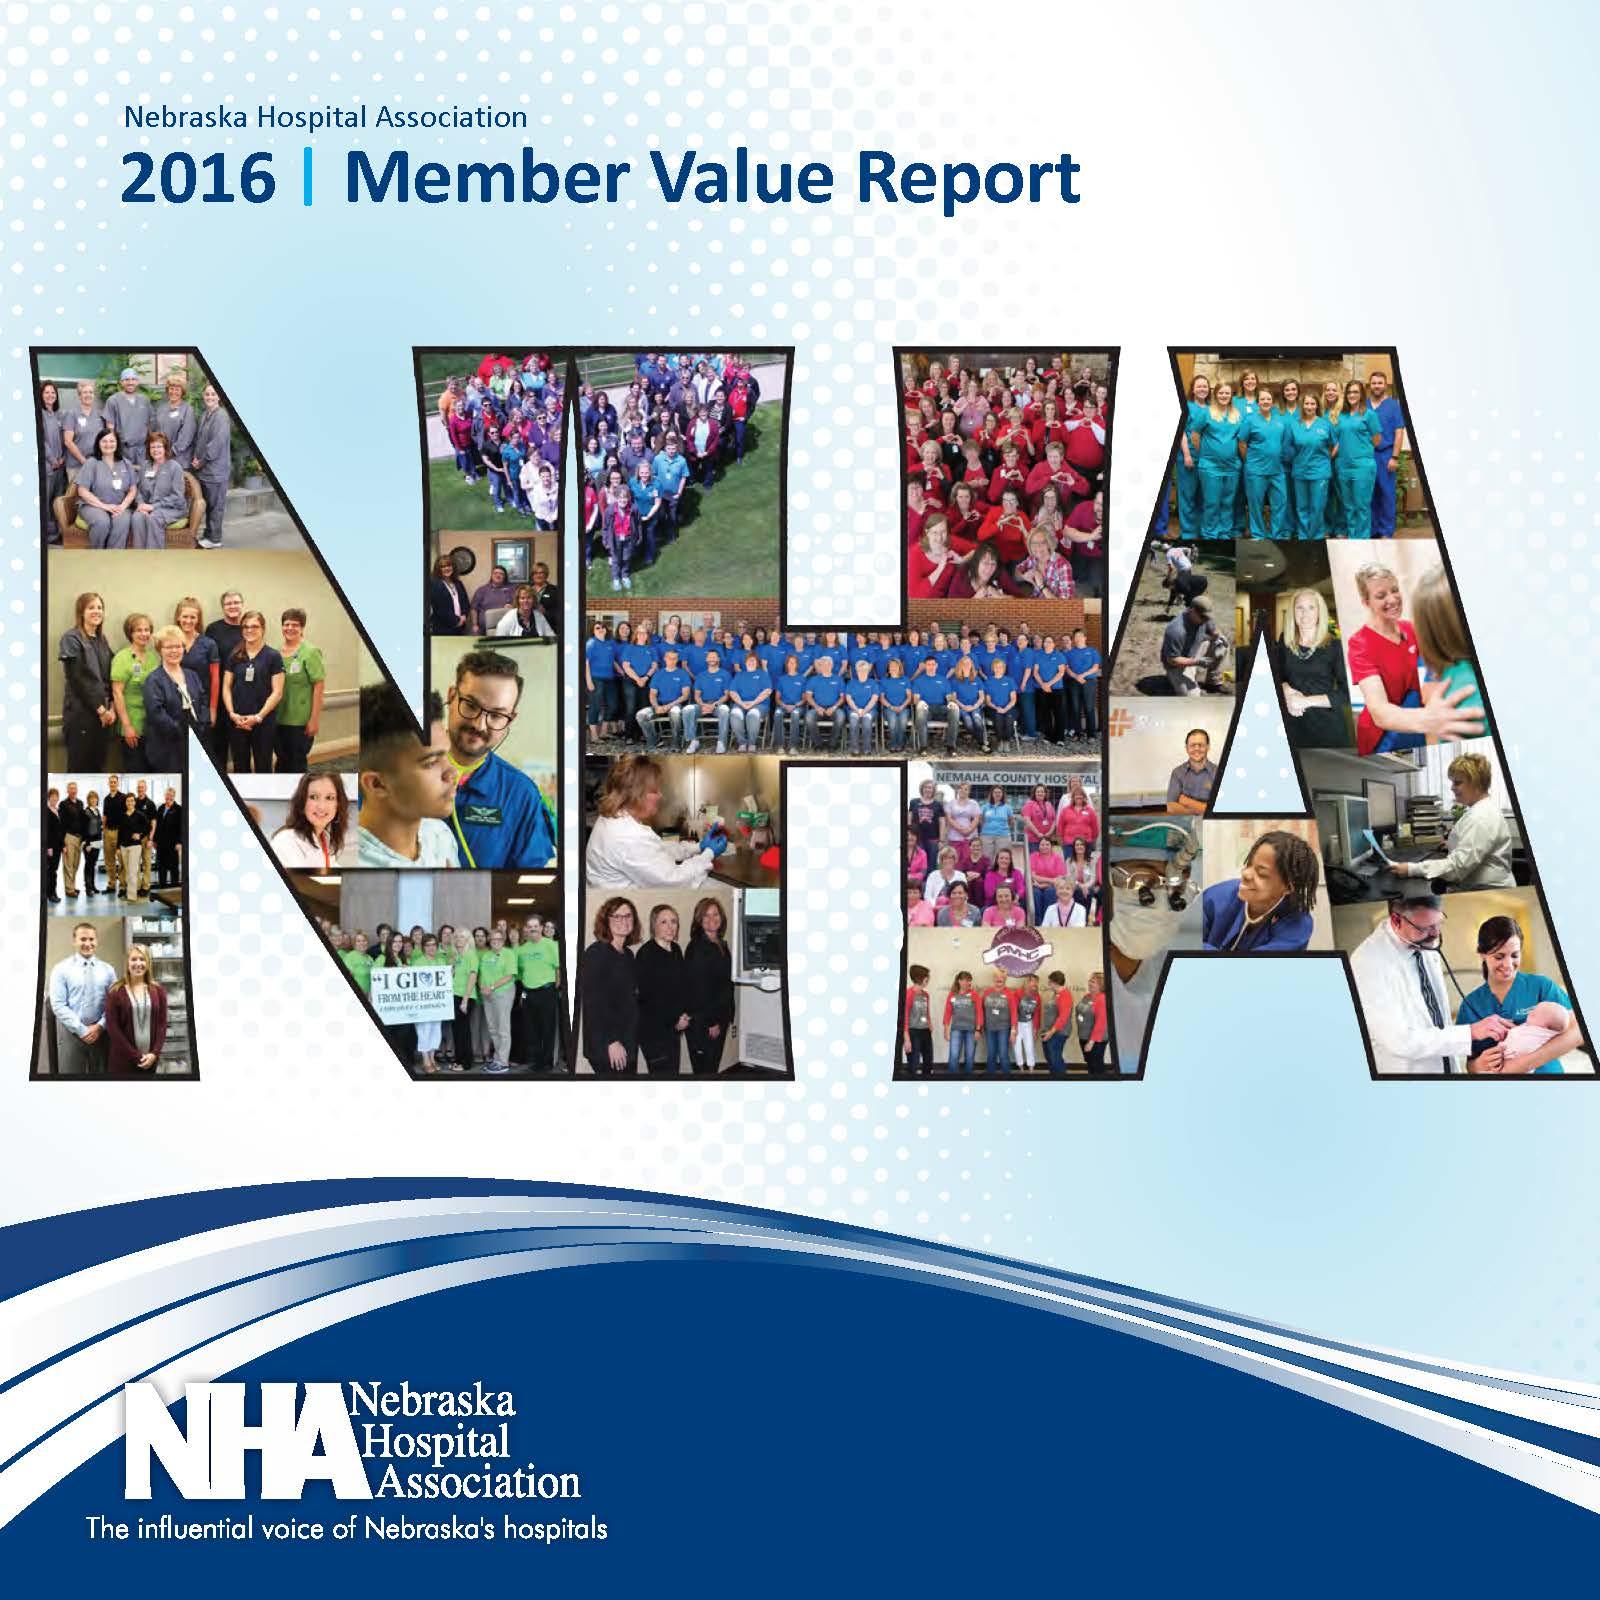 Member Value Report 2016